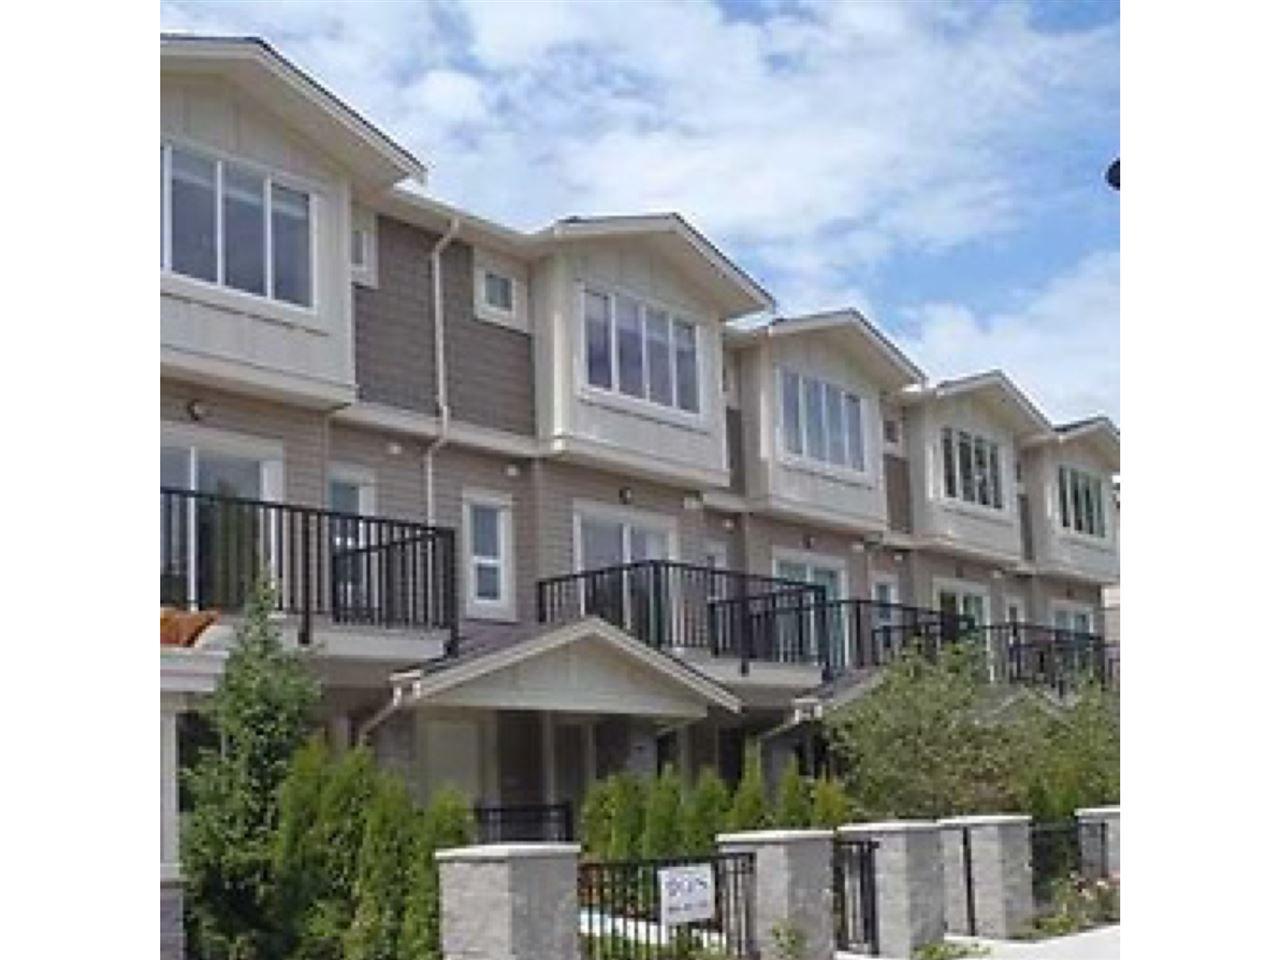 Main Photo: 19 7051 ASH Street in Richmond: McLennan North Townhouse for sale : MLS®# R2210552